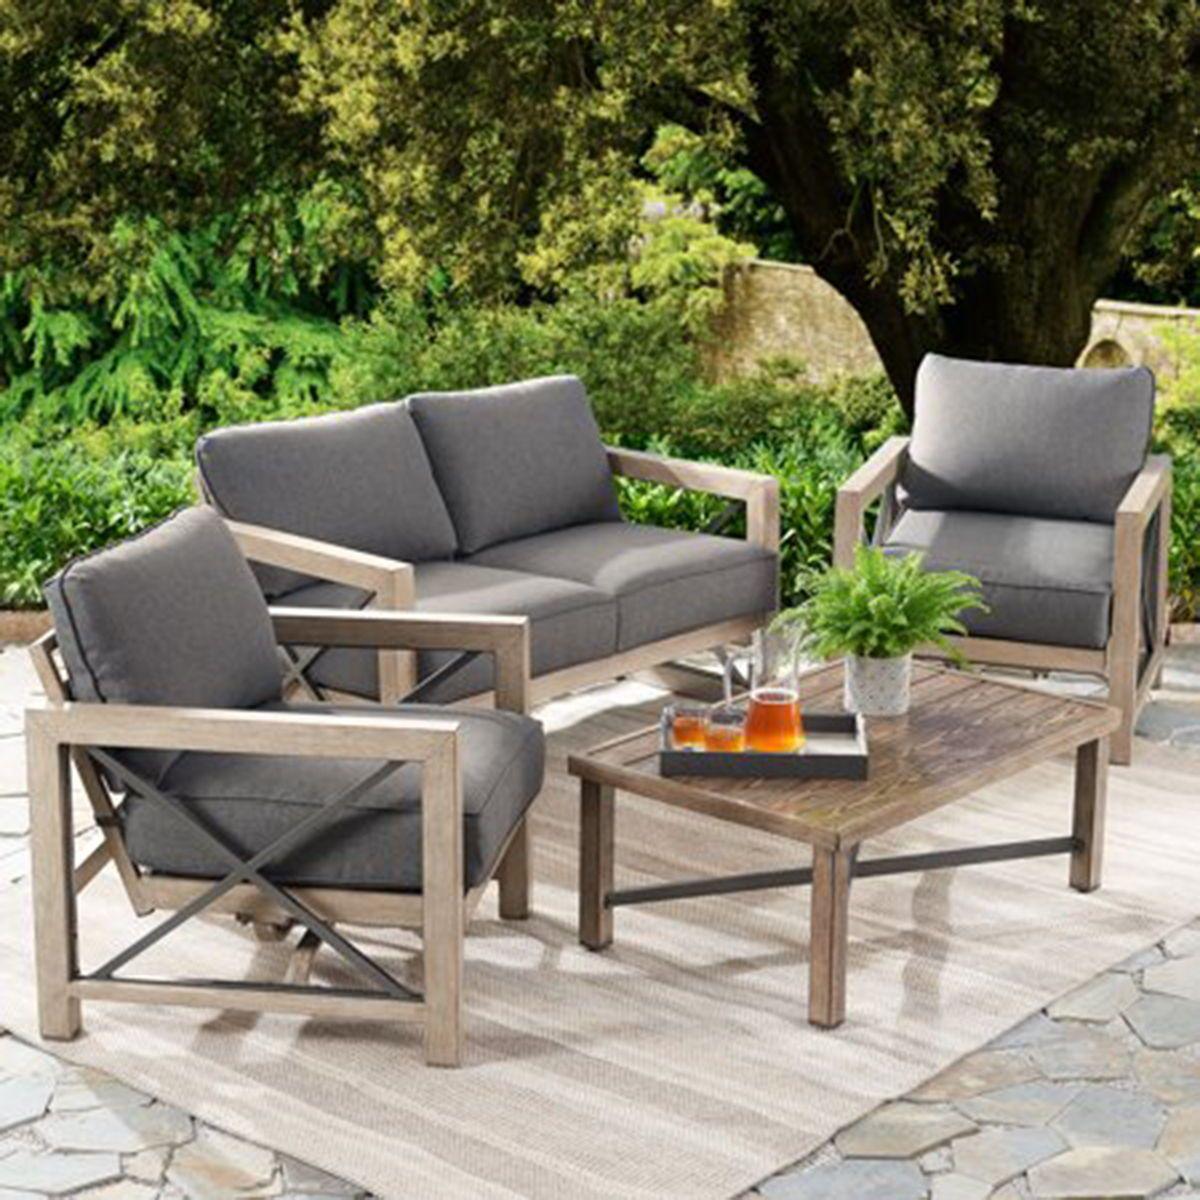 Patio Garden Patio Loveseat Patio Lounge Chairs Grey Cushions